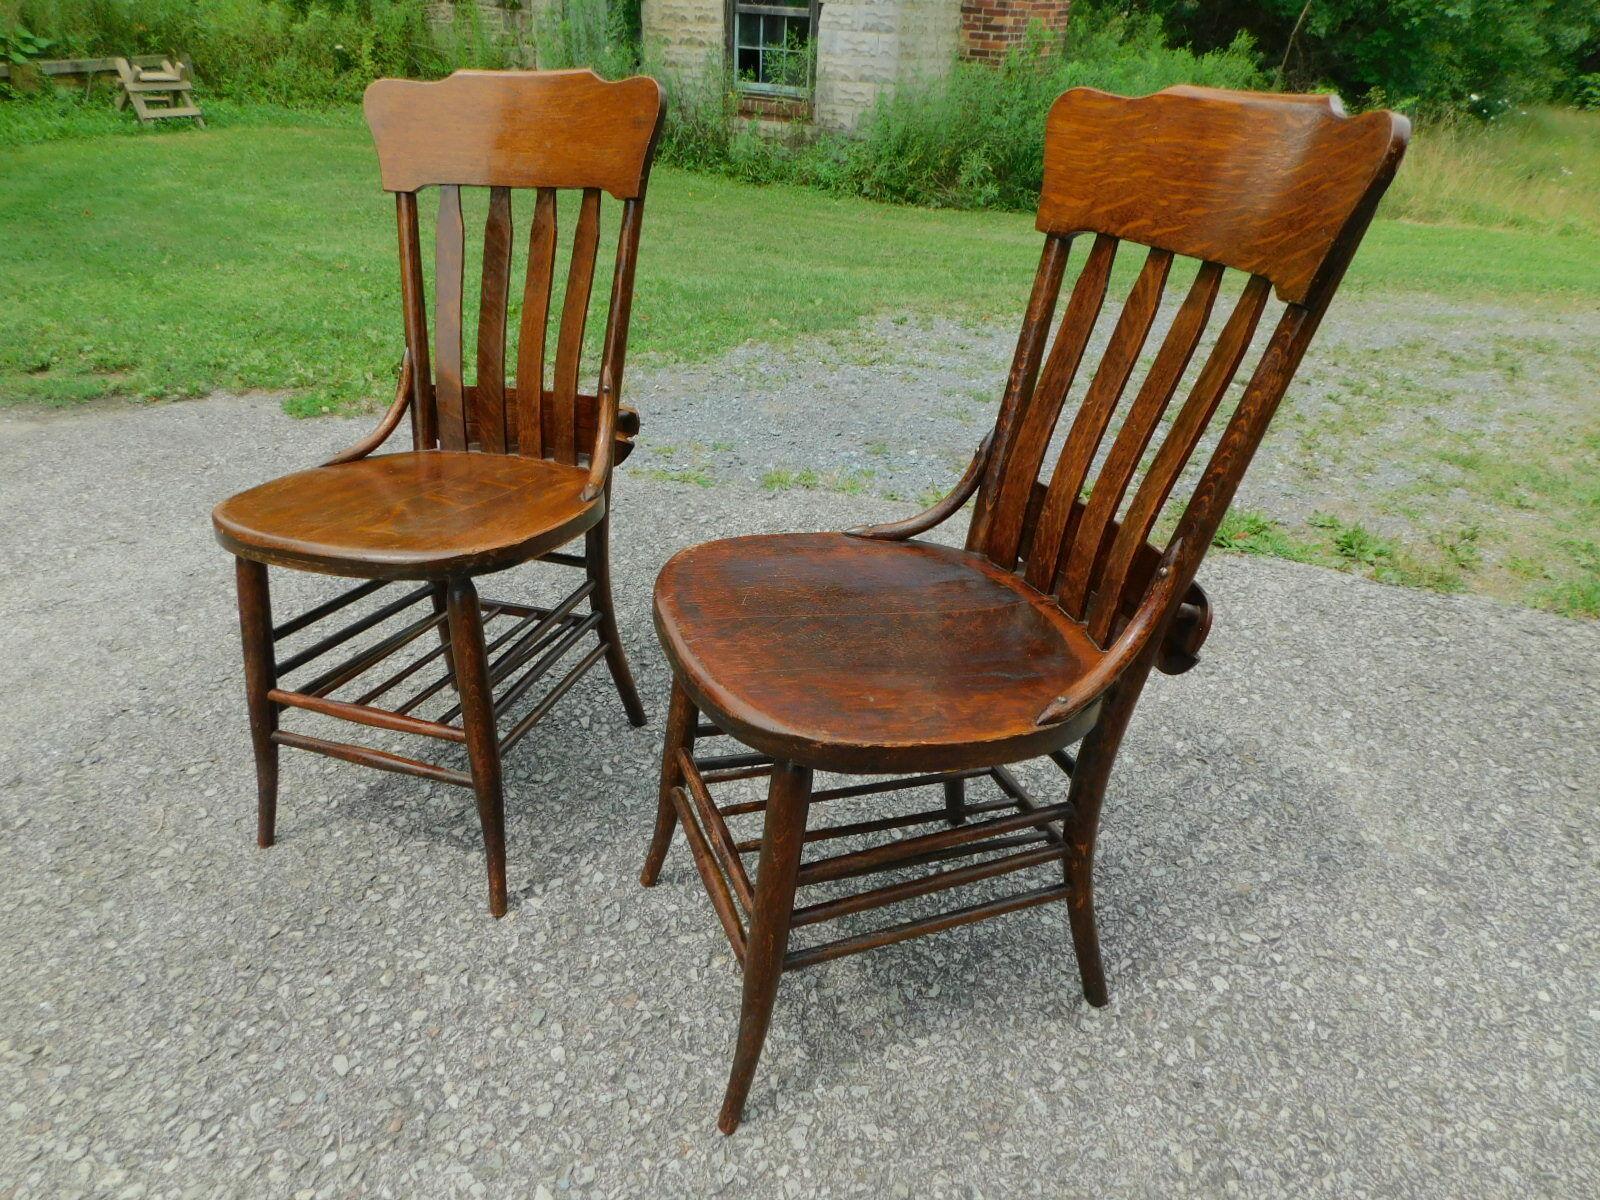 Pair 1890s Antique Solid Quartersawn Oak Windsor Book Shelf Desk Office Chairs - $475.00